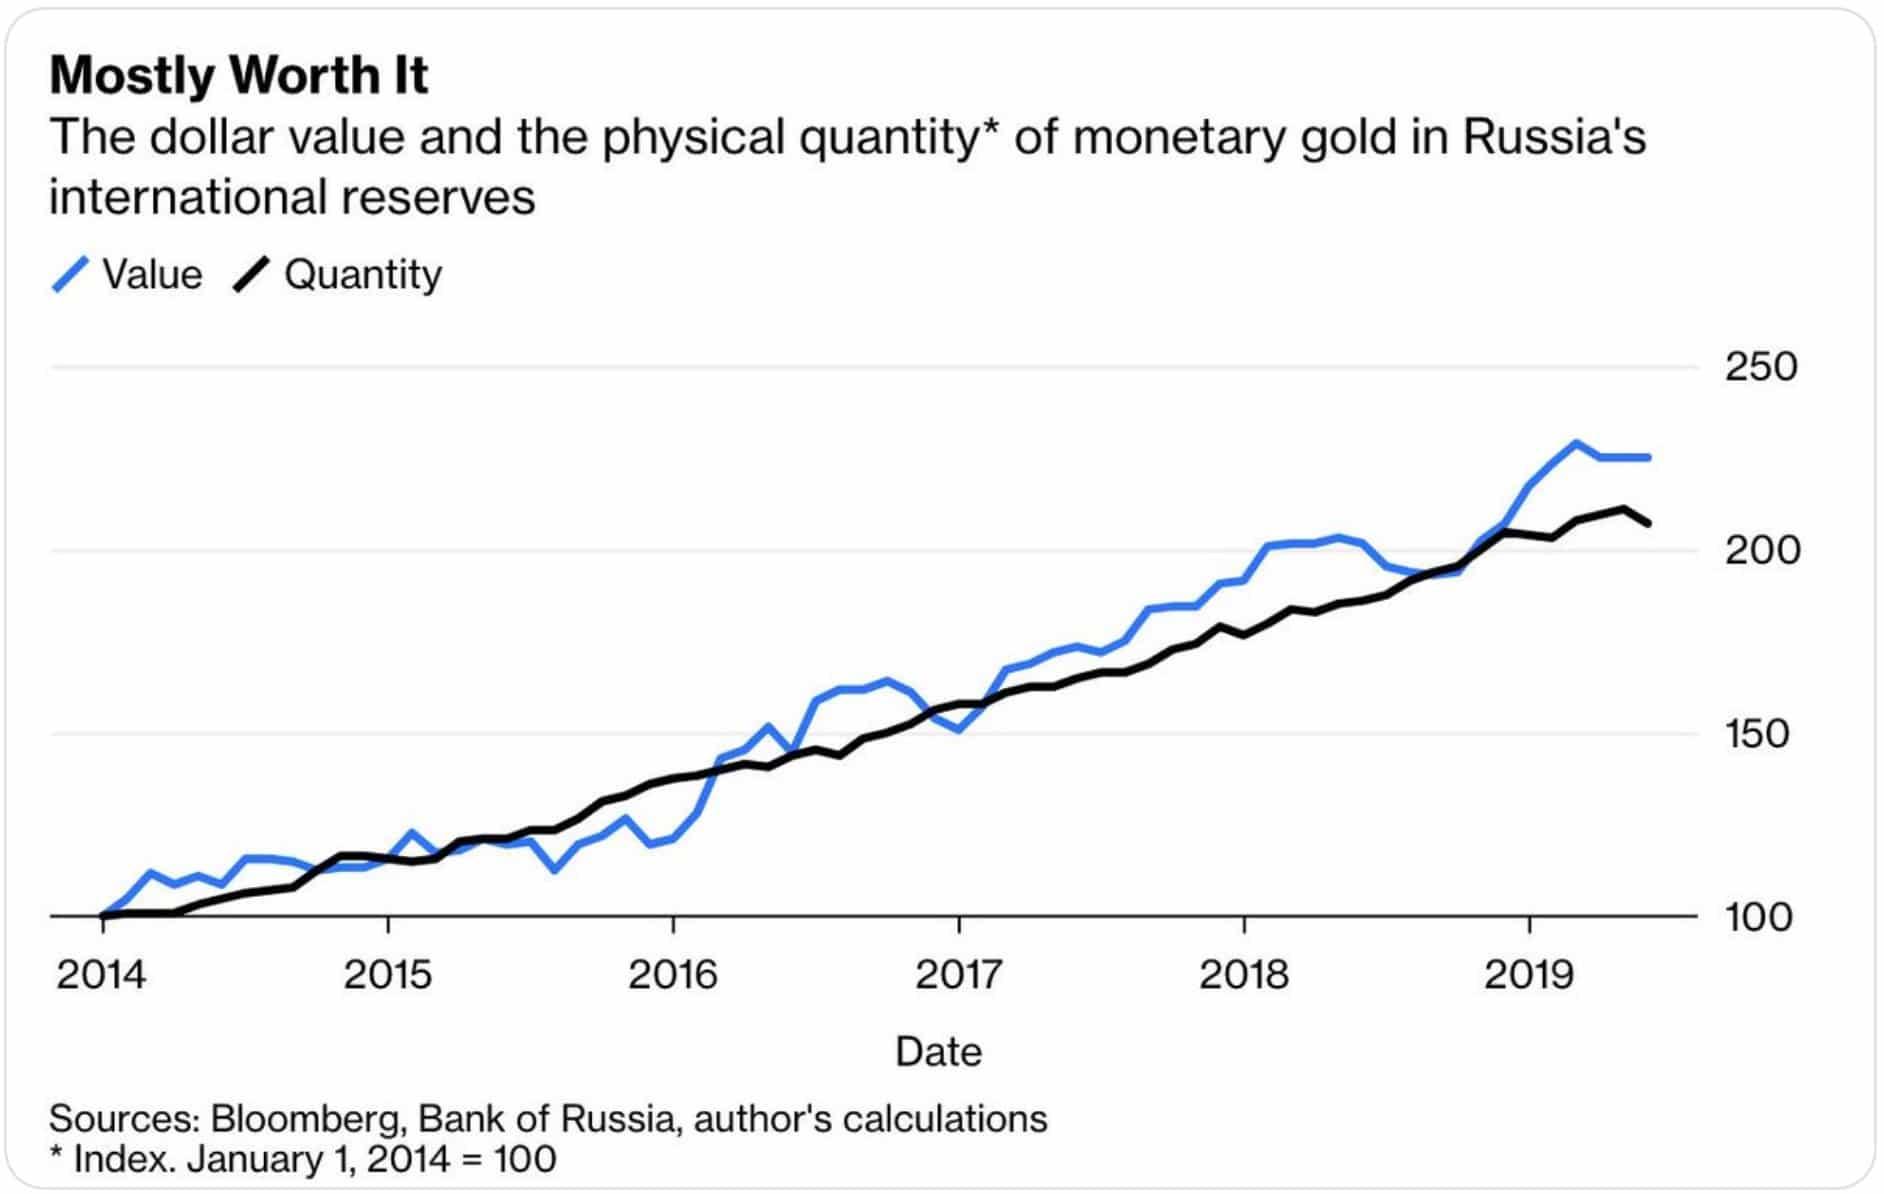 russia-s-international-reserves-2019-june